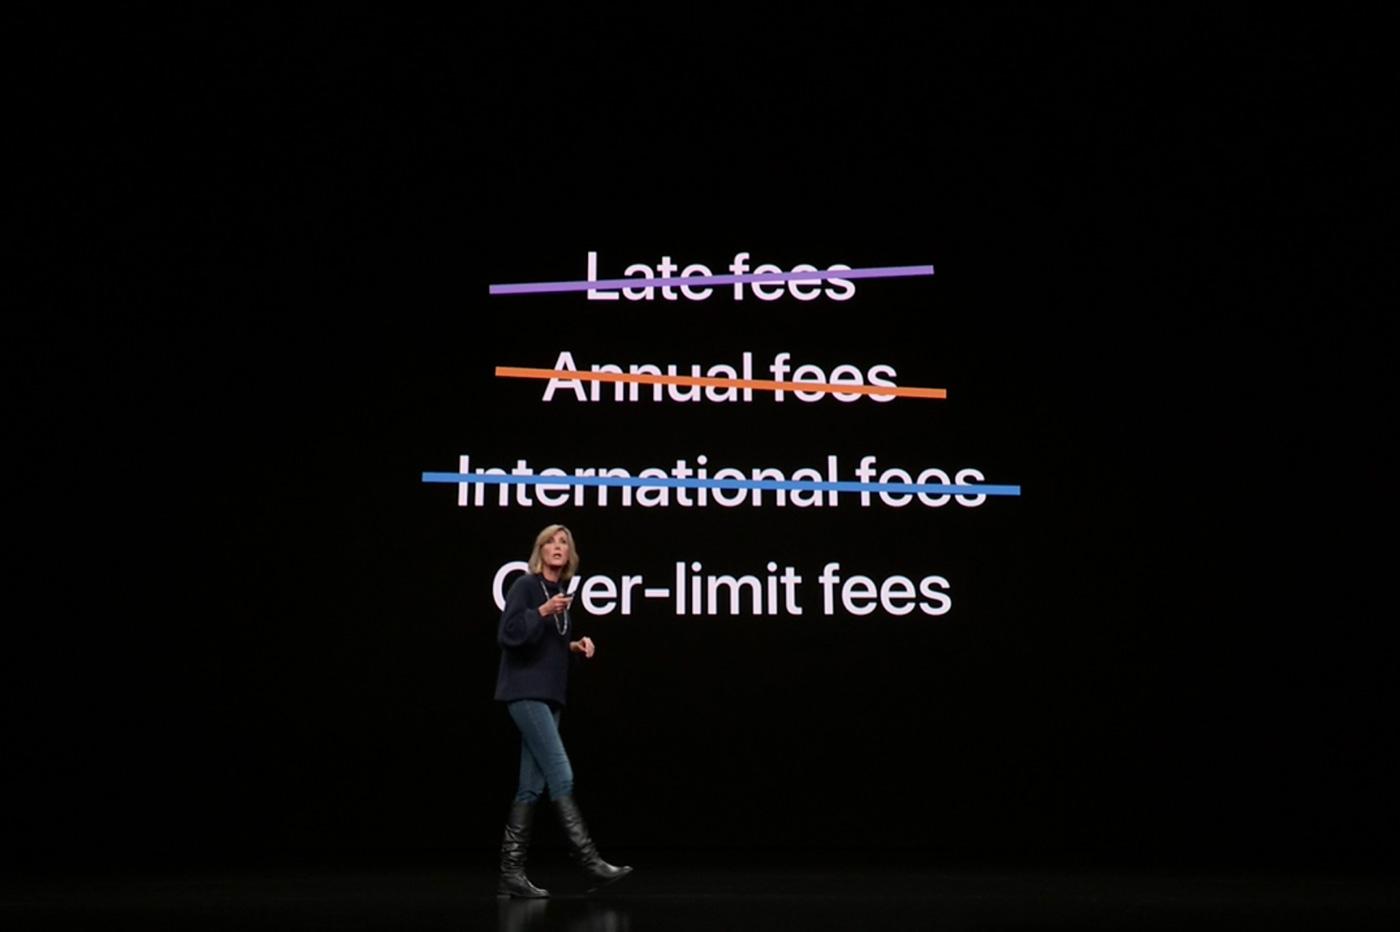 Apple card fees